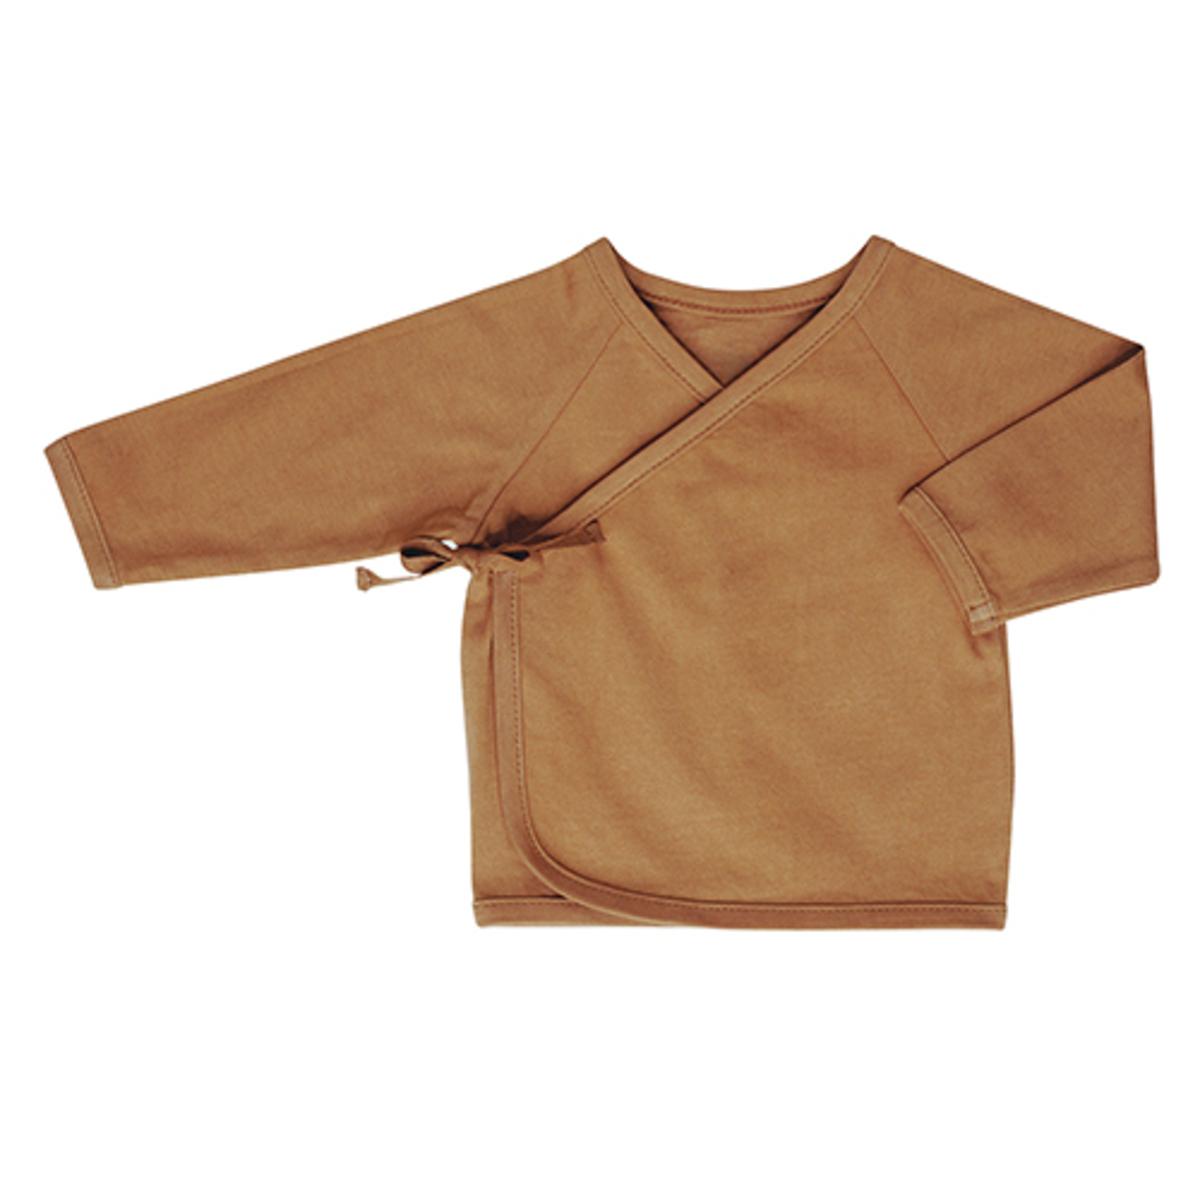 Haut bébé Cardigan Kimono Nut - 6 Mois Cardigan Kimono Nut - 6 Mois